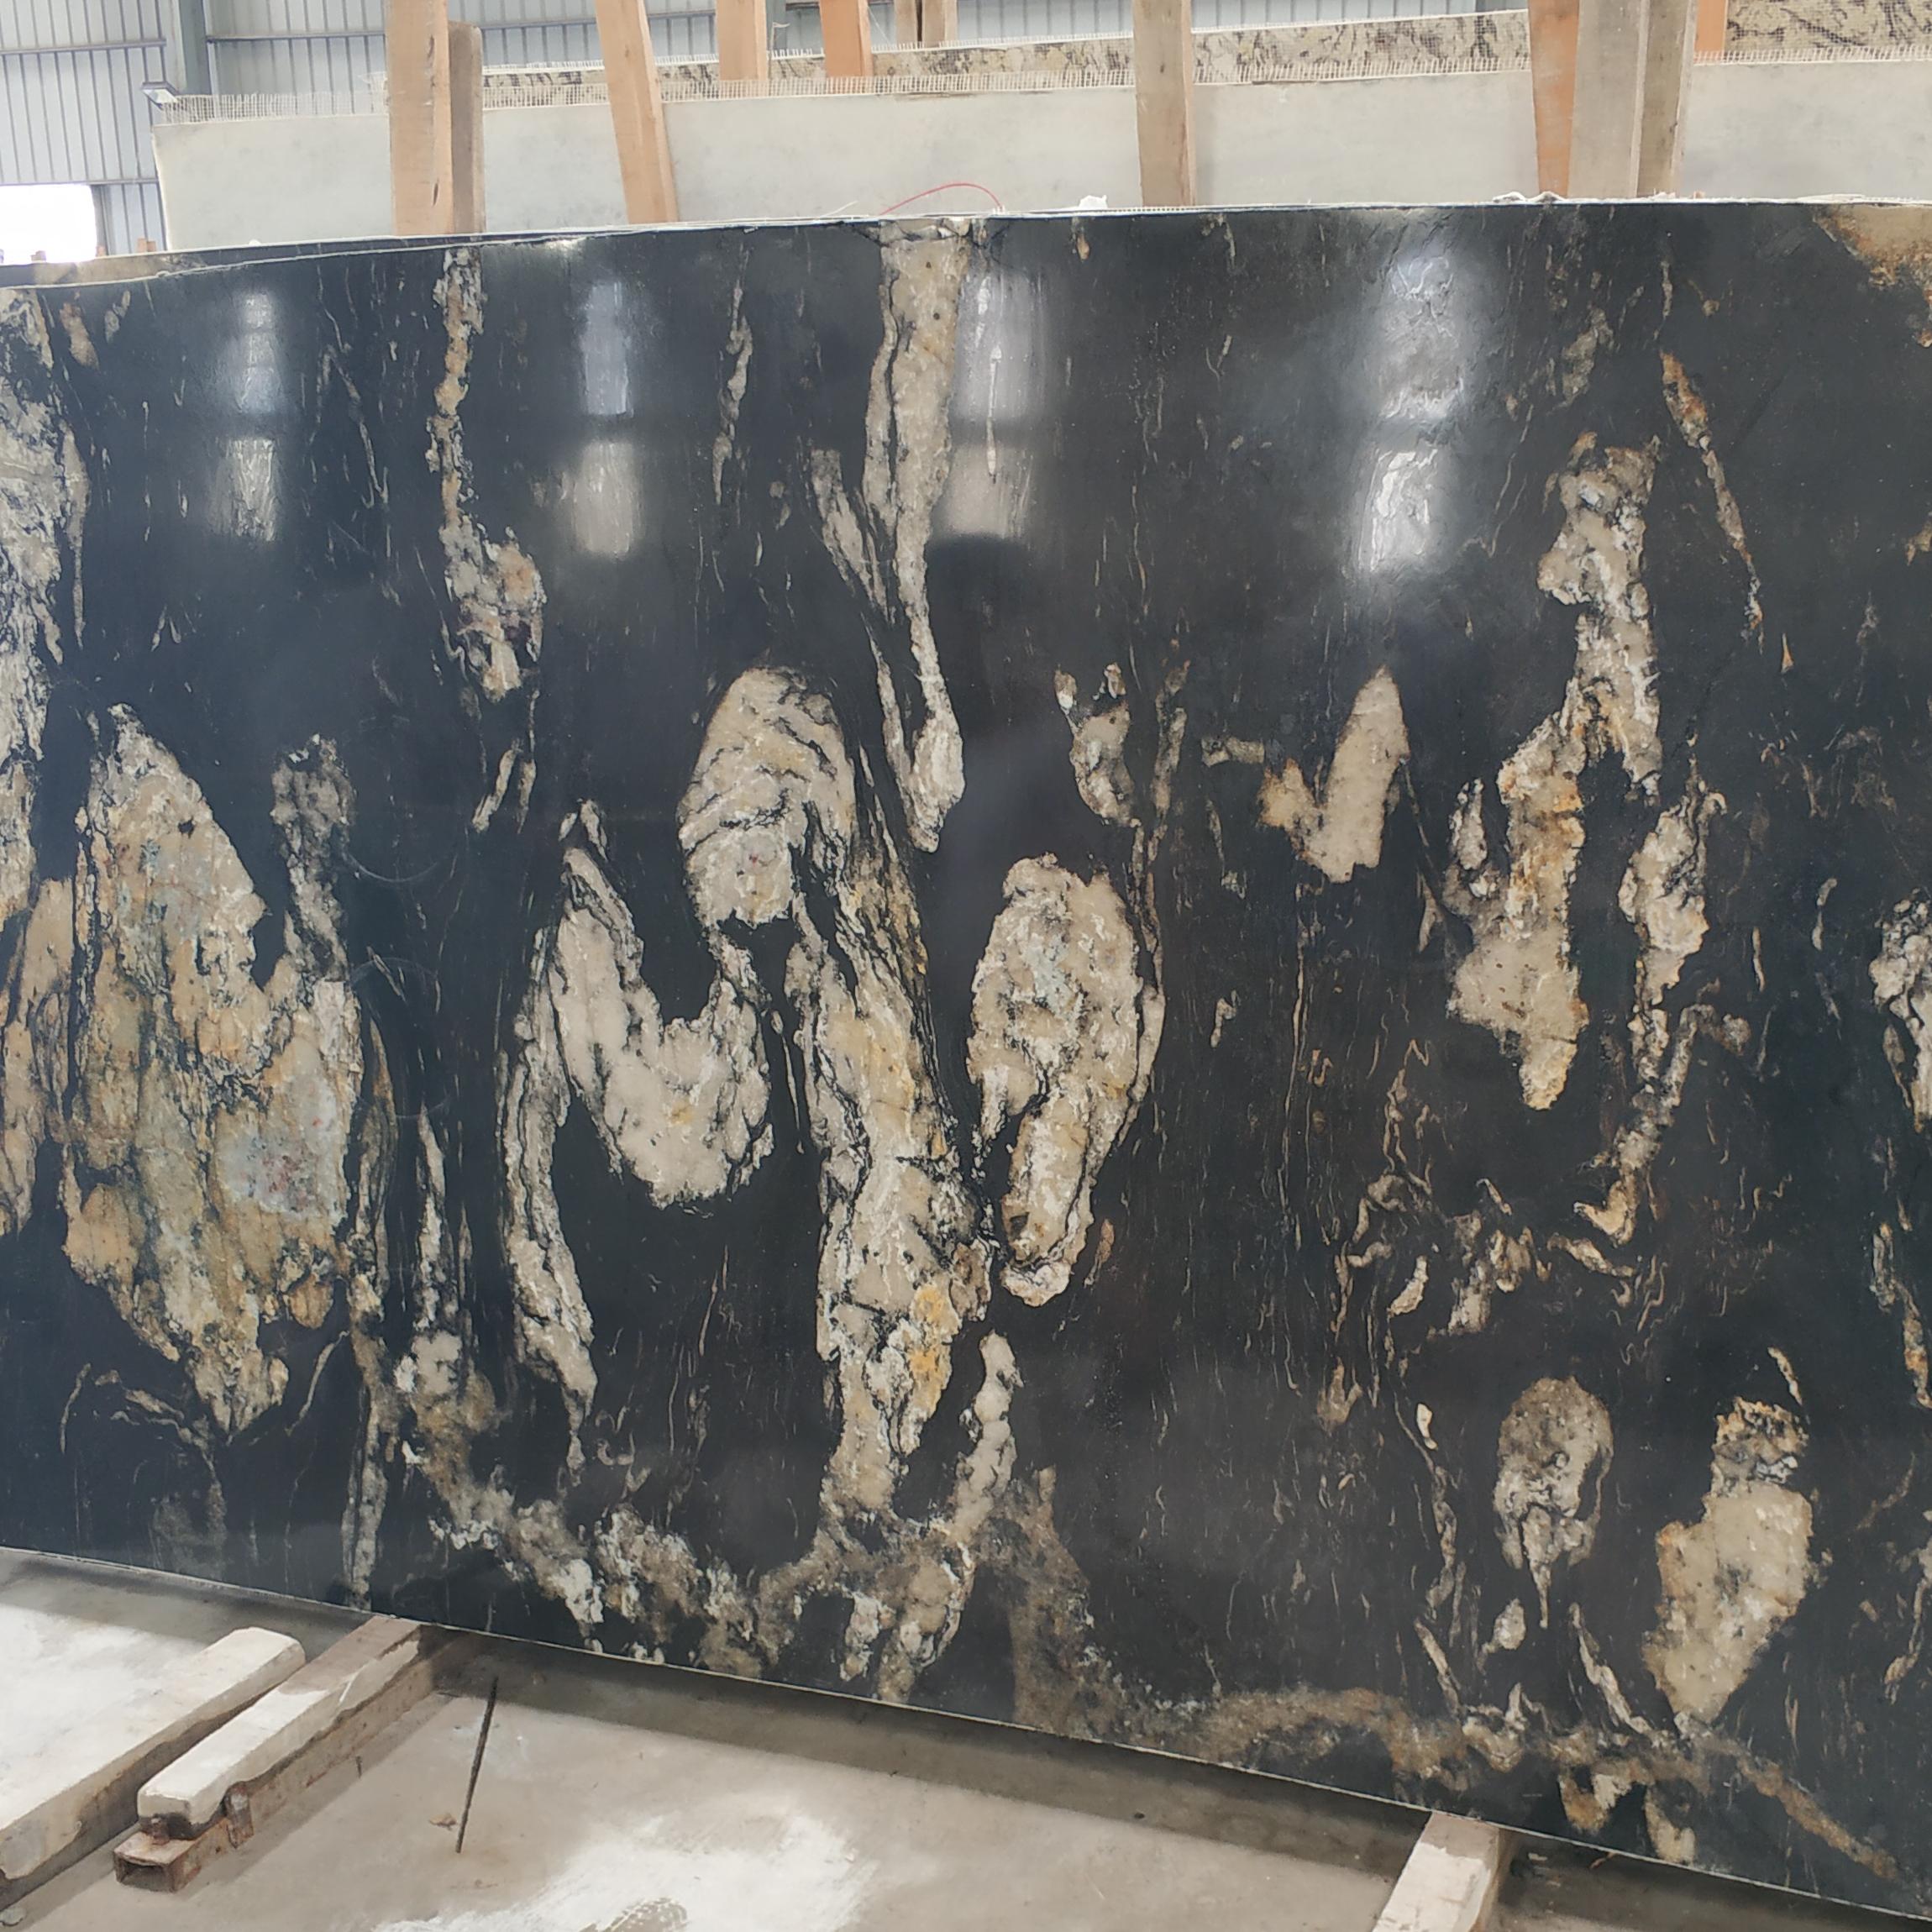 Black Titanium Granite Slab For Kitchen Countertop Buy Cosmic Black Granite Countertop Black Granite Slabs Black Titanium Granite For Countertop Product On Alibaba Com